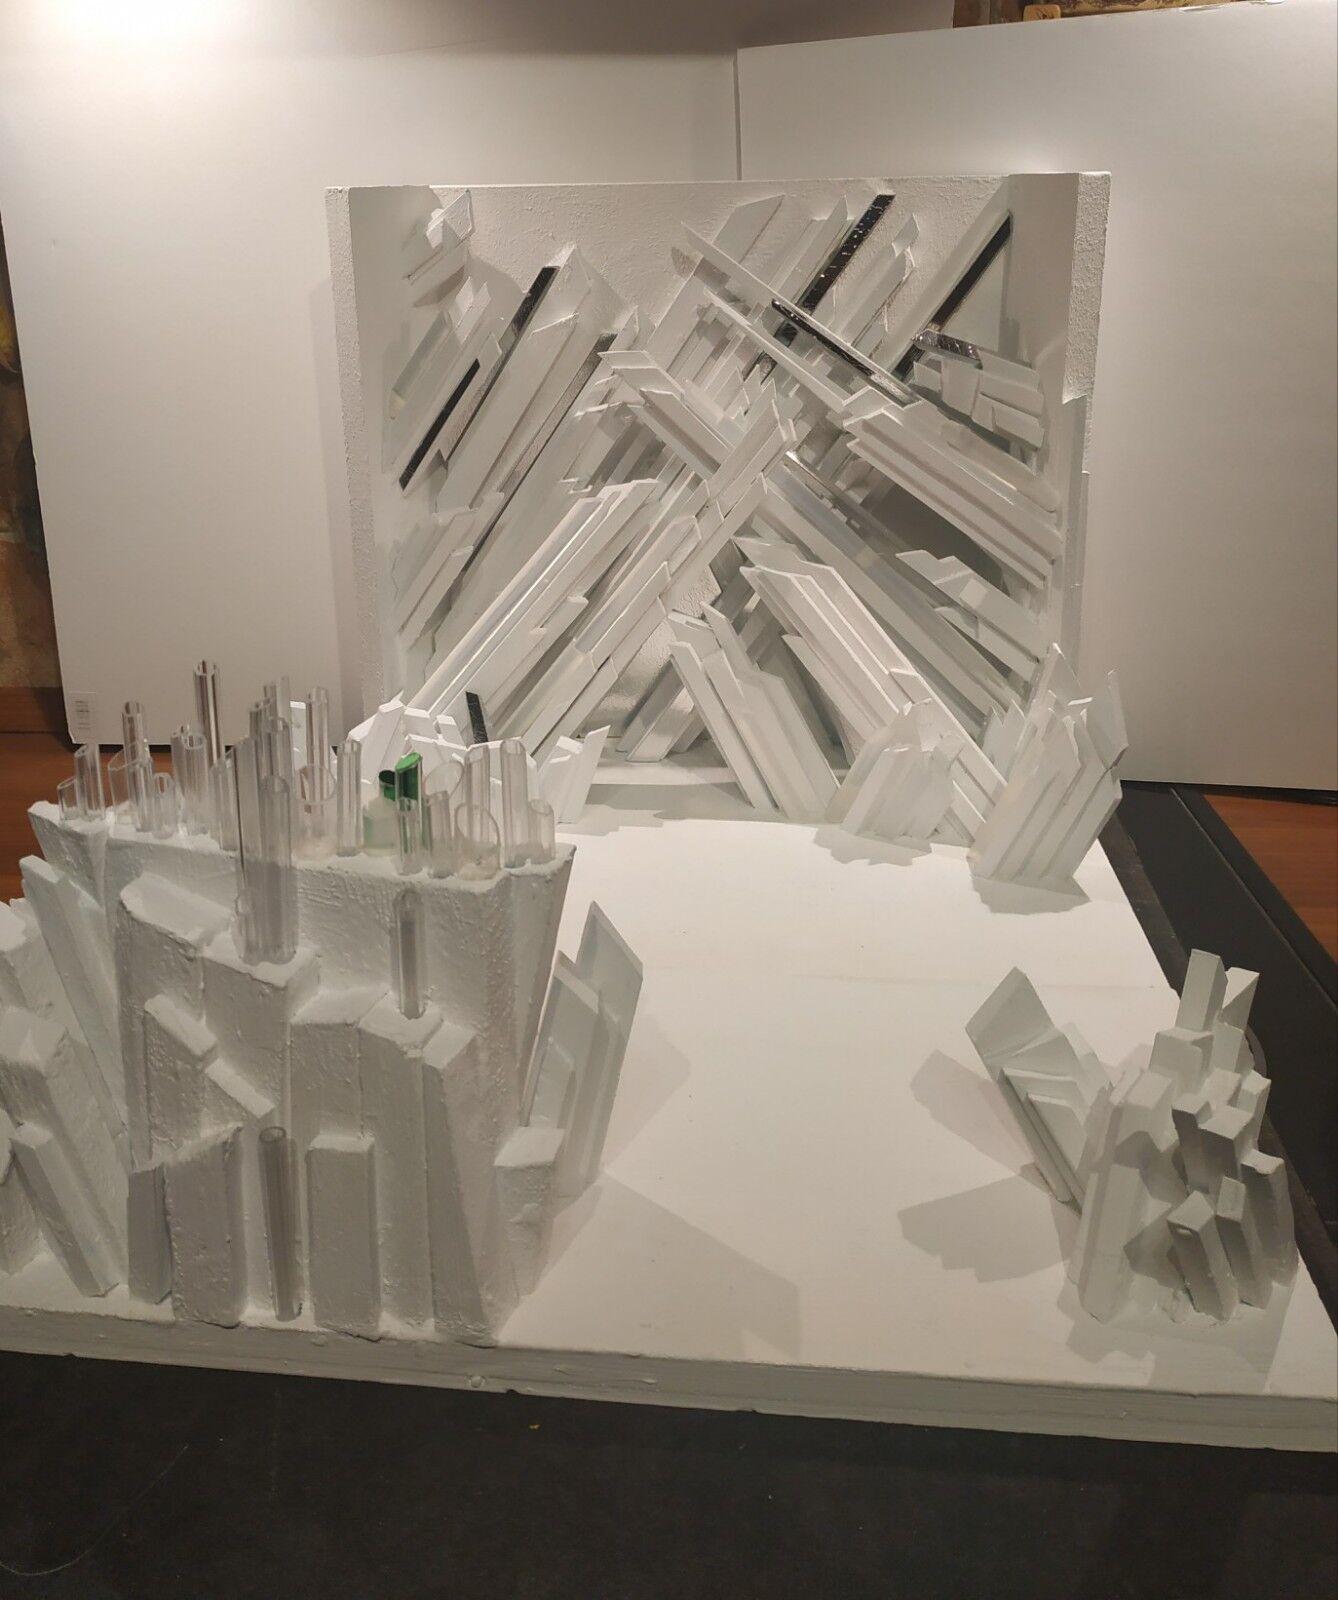 Superman solitude diorama 12